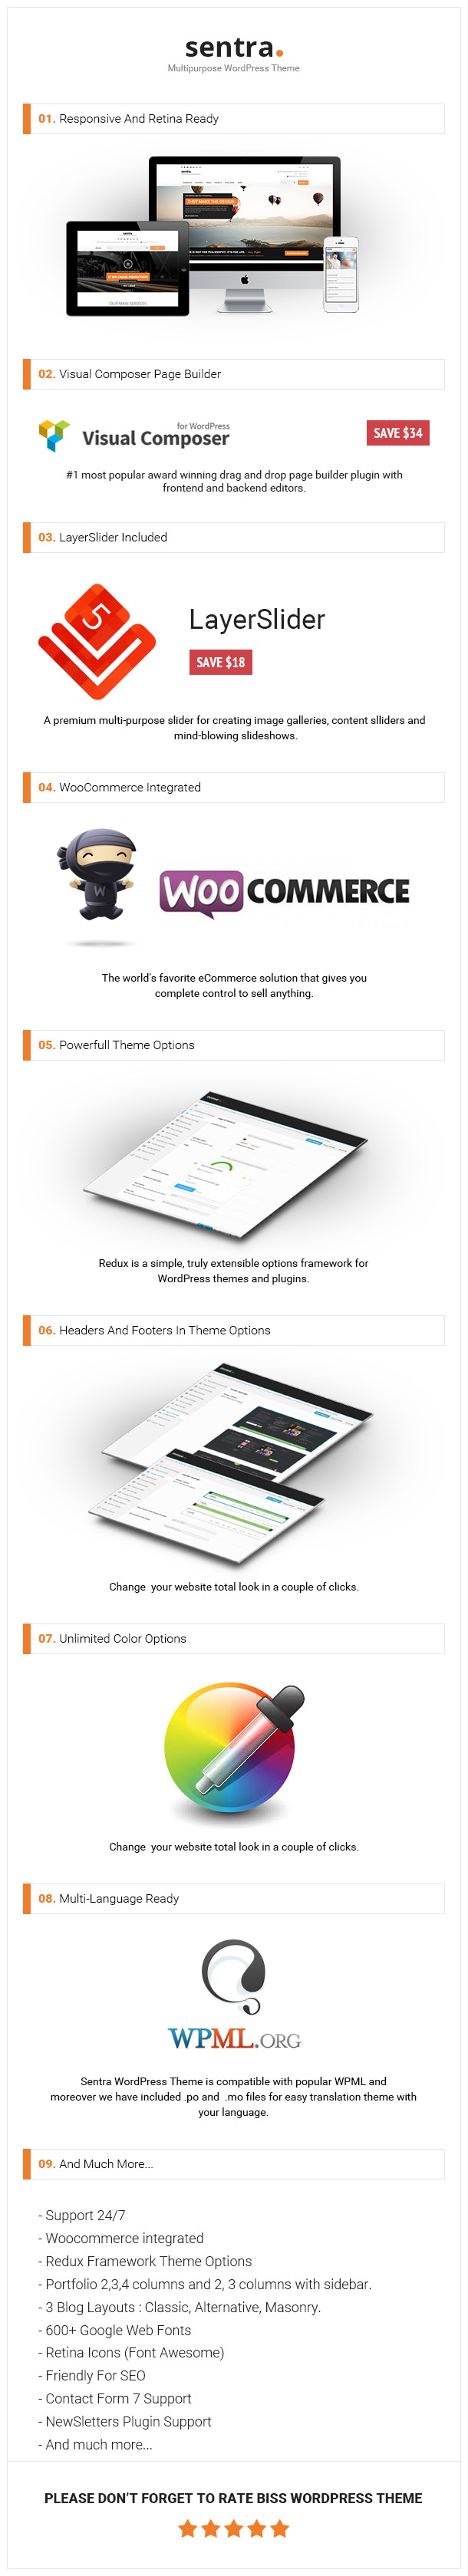 Sentra - Tema Corporativo Multipurpose WordPress